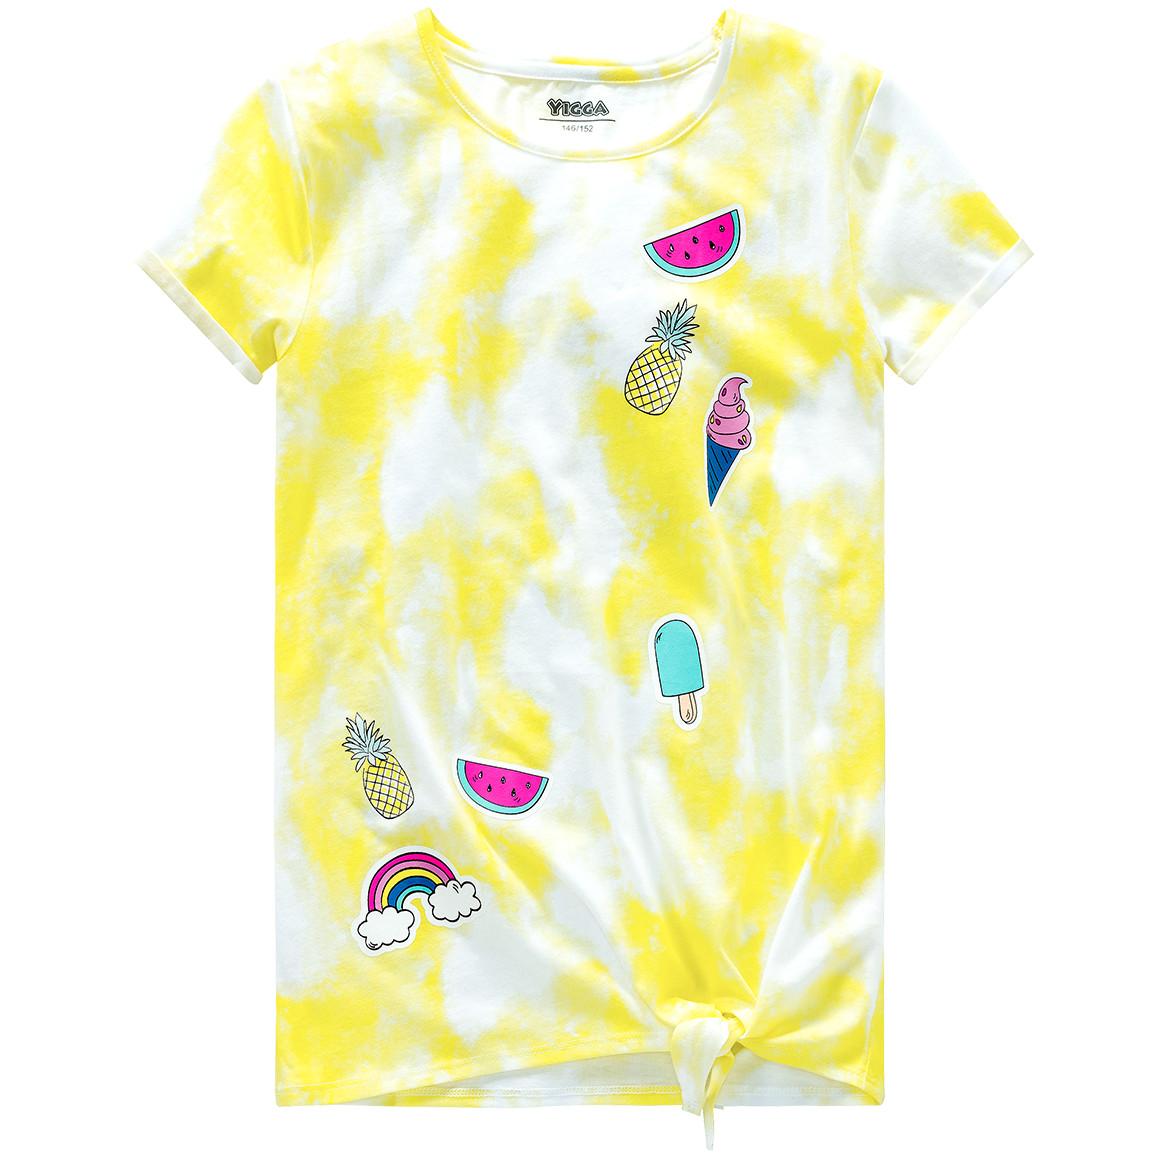 Mädchen T-Shirt im Batik Look